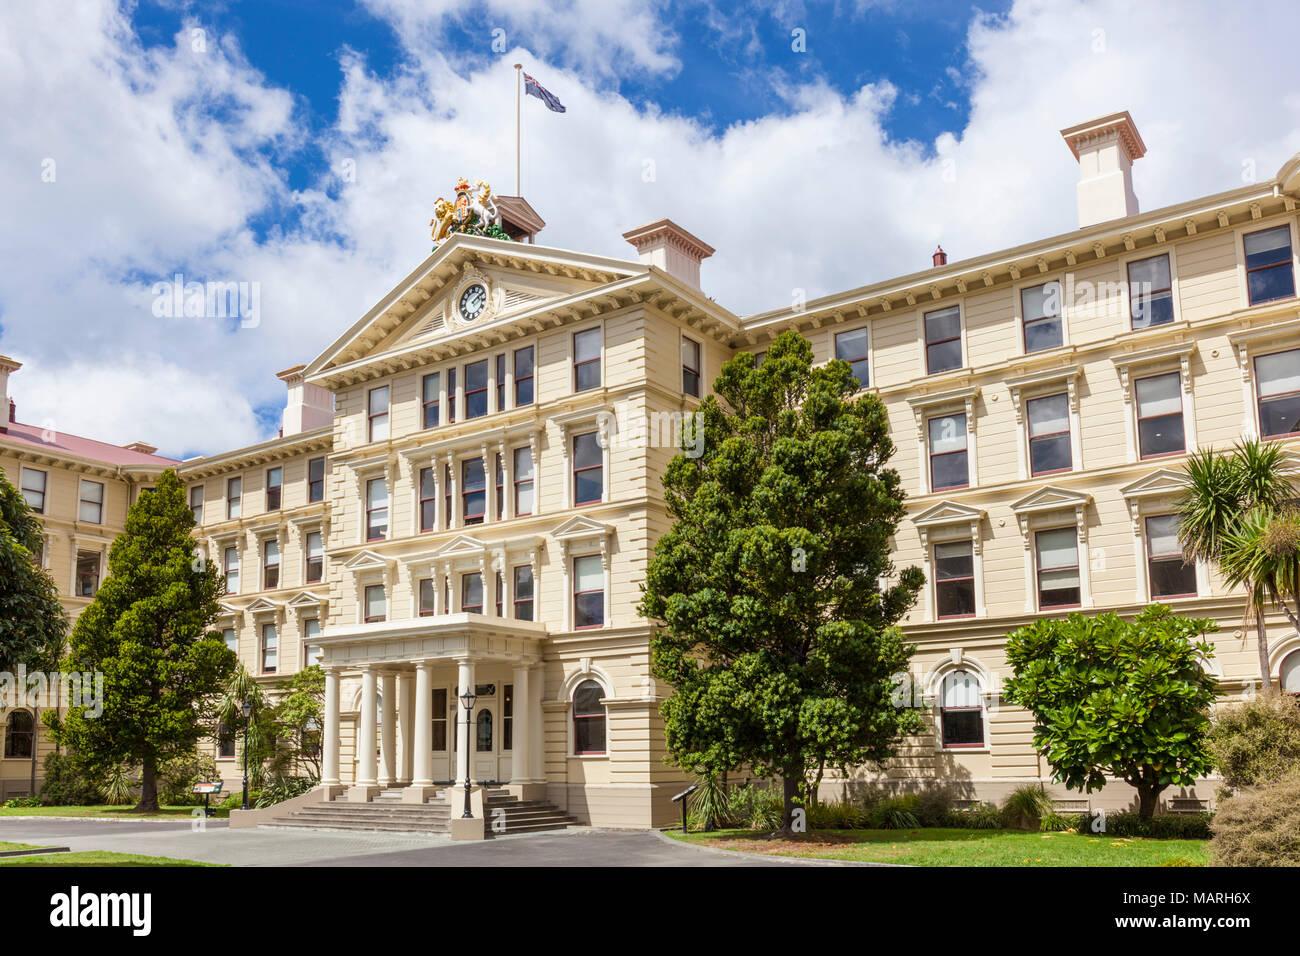 New Zealand Wellington New Zealand Victoria University Law Faculty